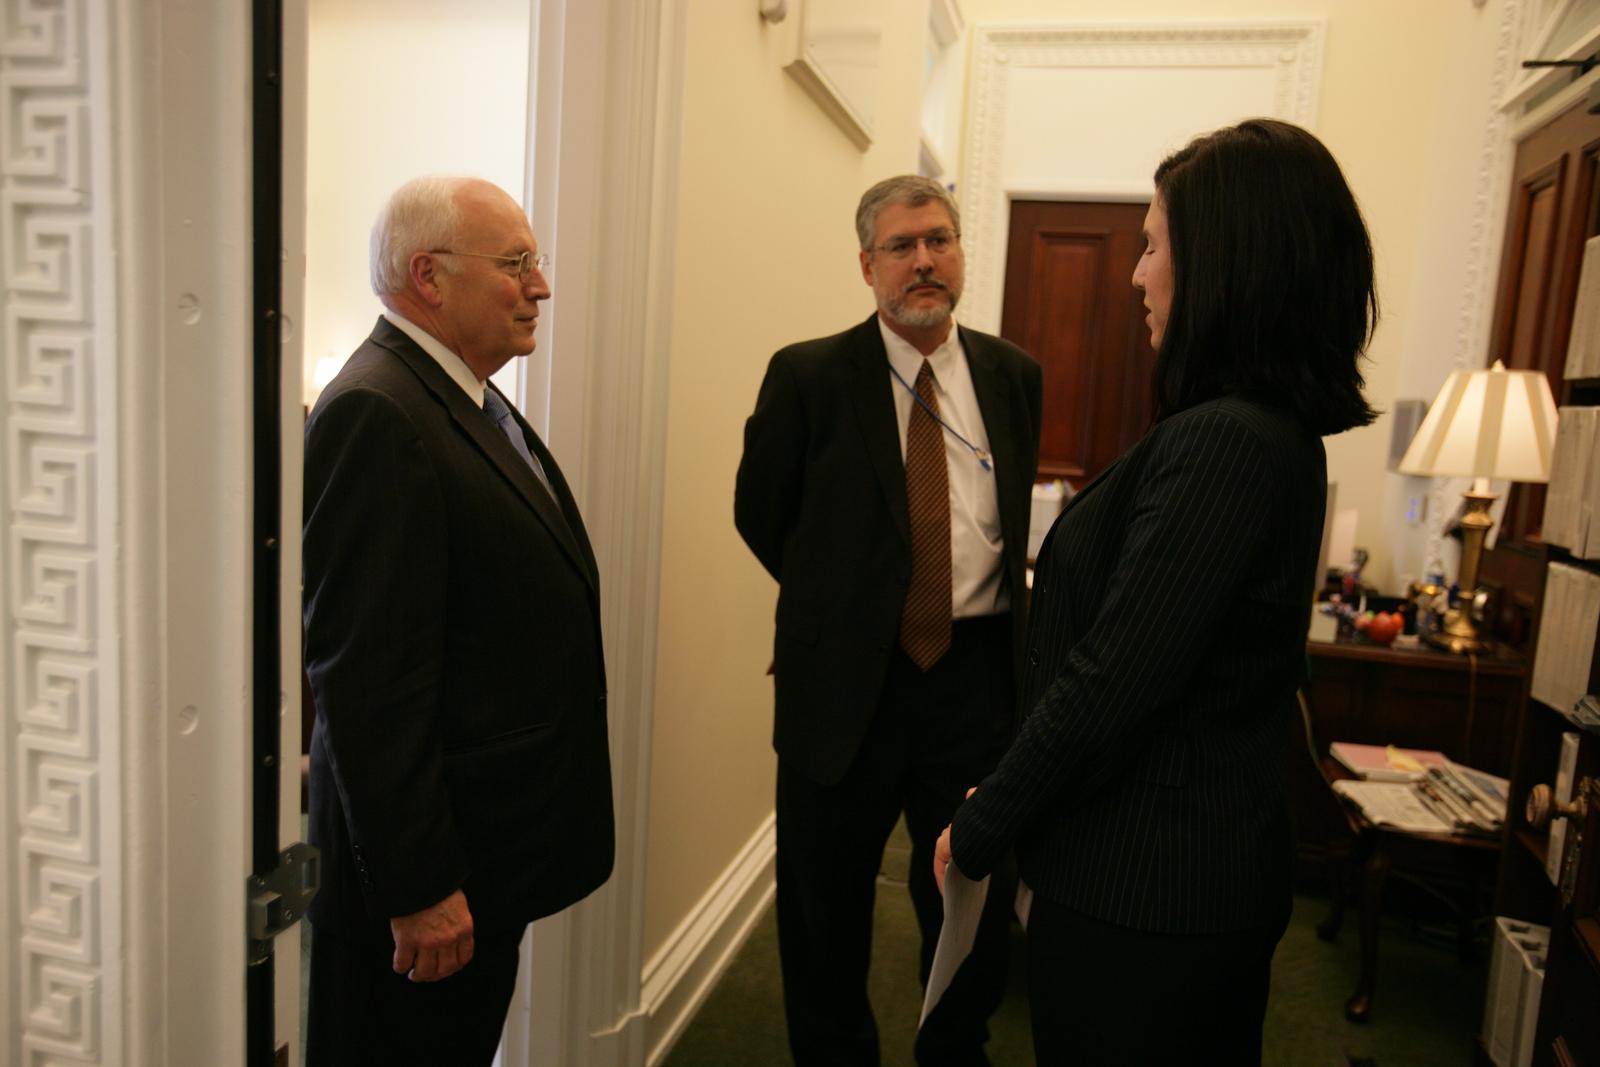 Vice President Cheney Talks with Elyssa Larranaga and David Addington